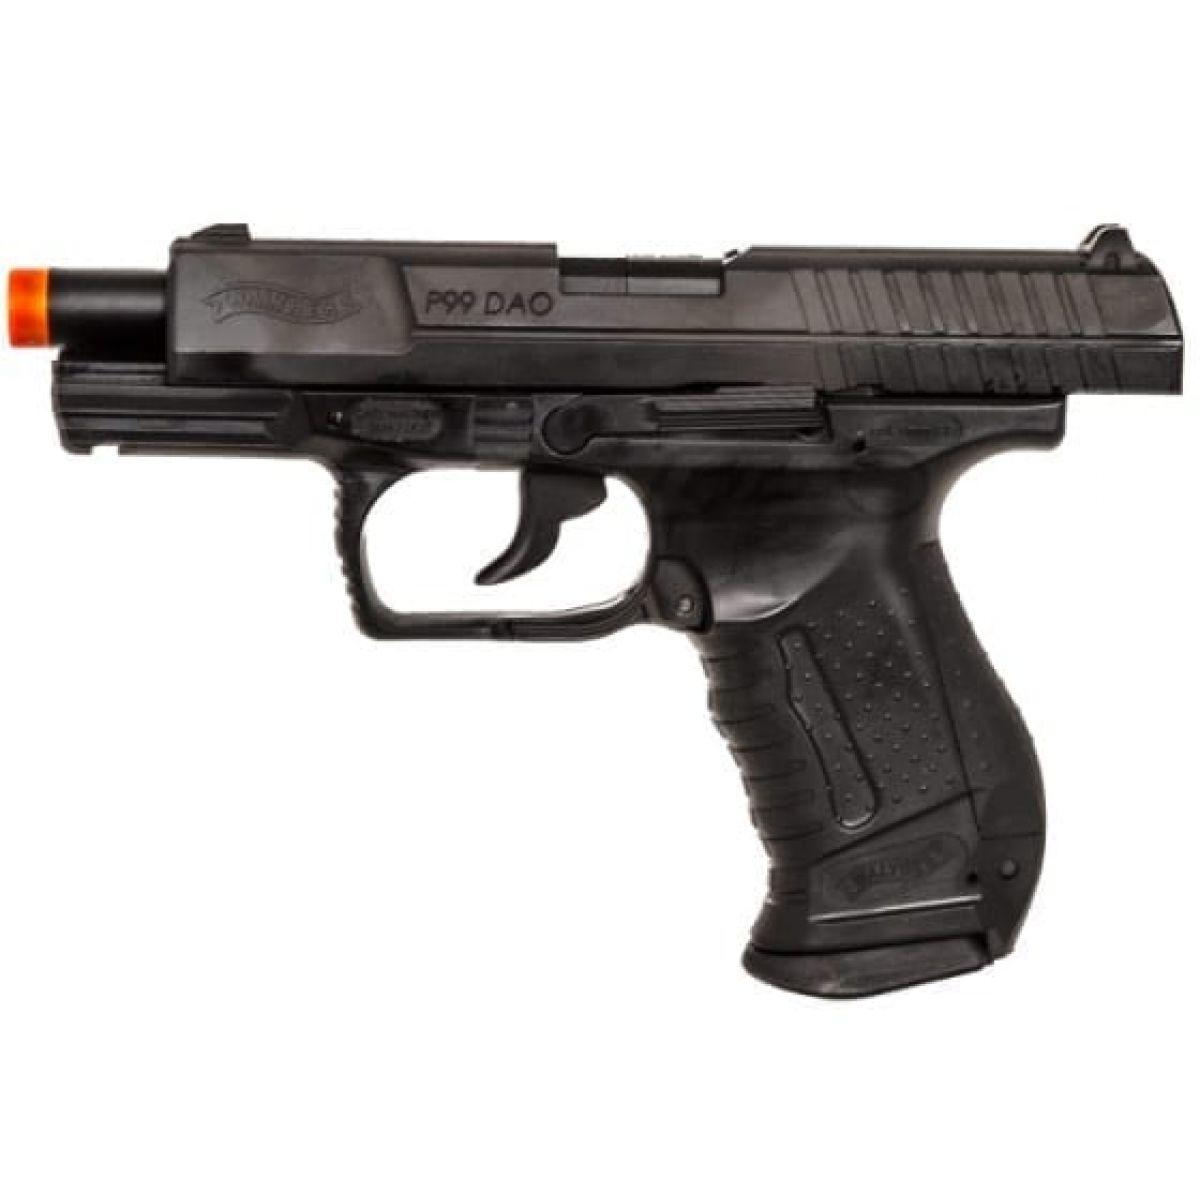 Gen. 2 P99 DAO CO2 Blowback Airsoft Pistol umarex